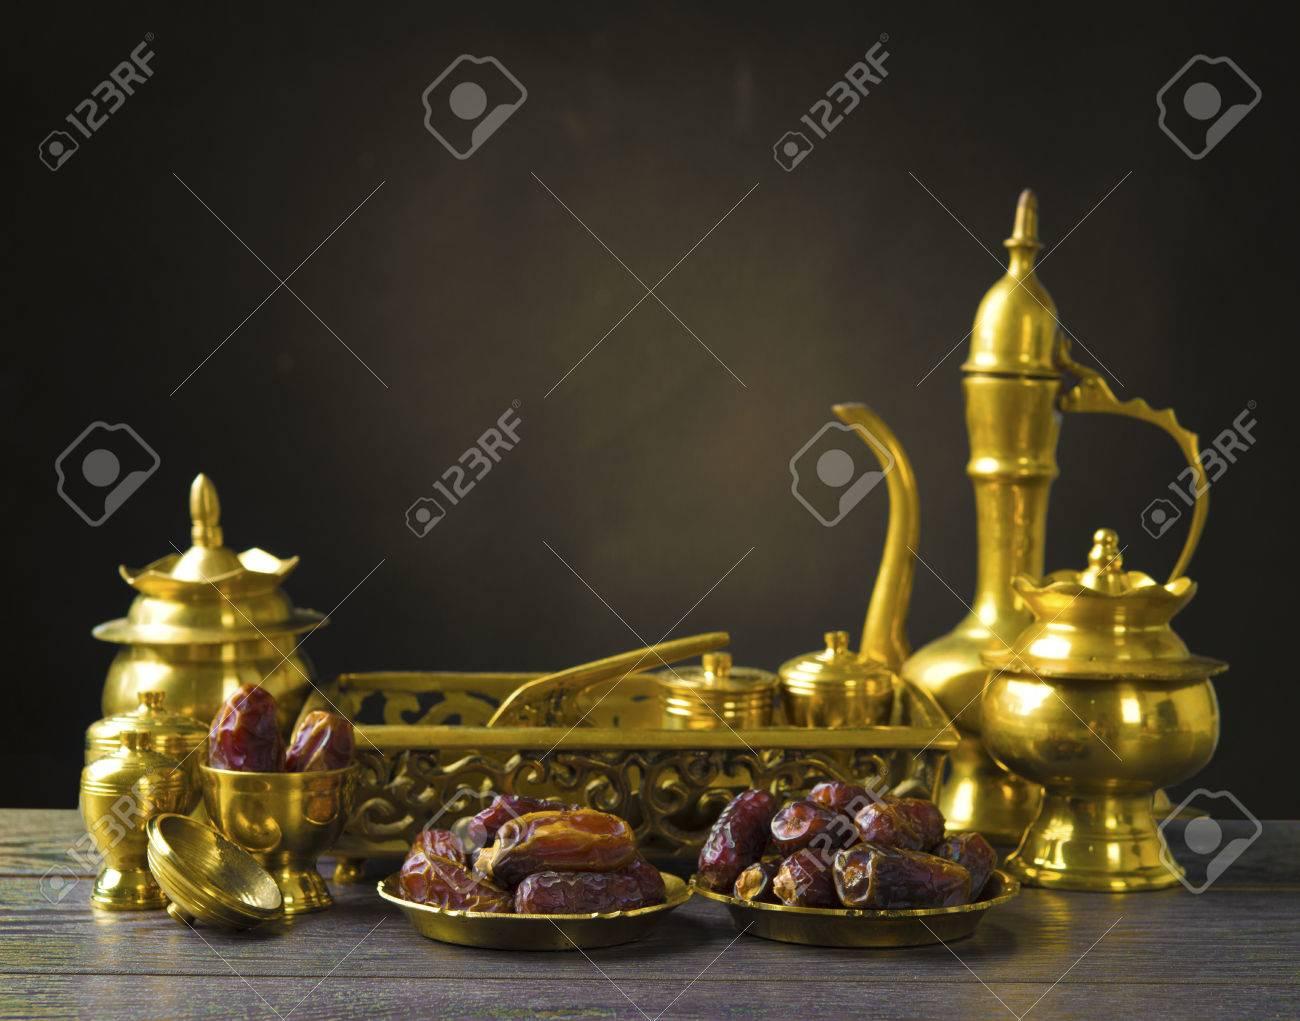 ramadan food also known as kurma , Palm dates Stock Photo - 22847979